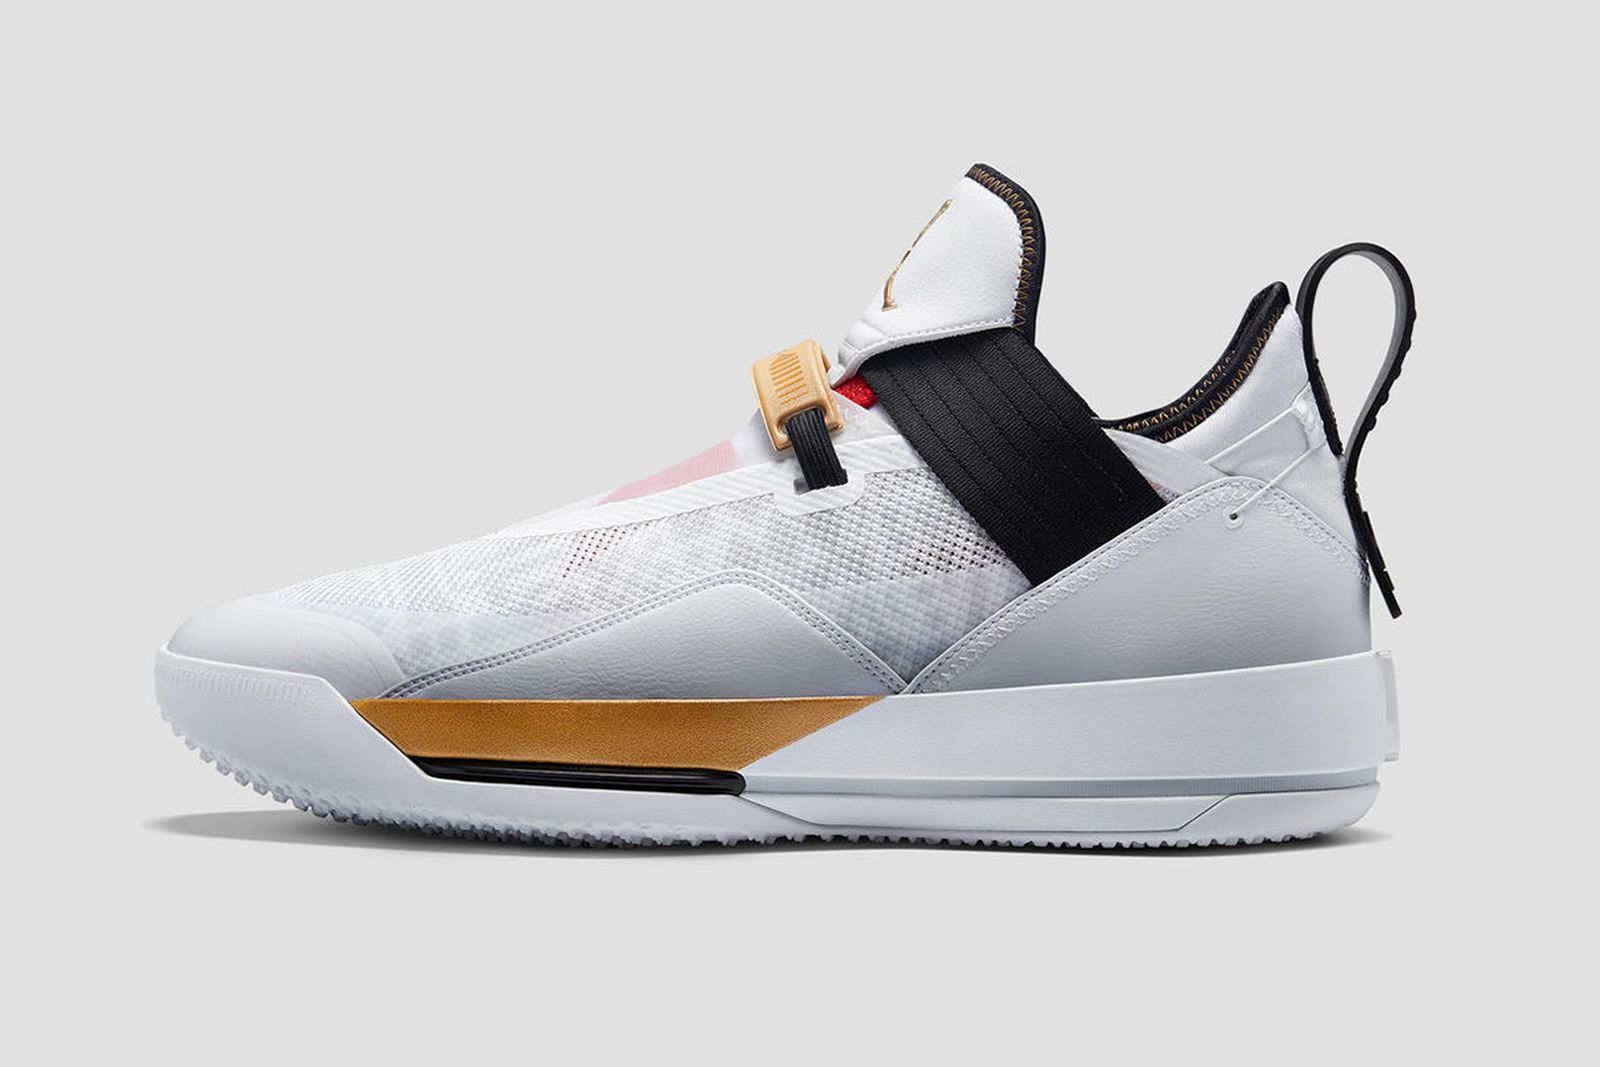 jordan brand fiba 2019 collection Nike